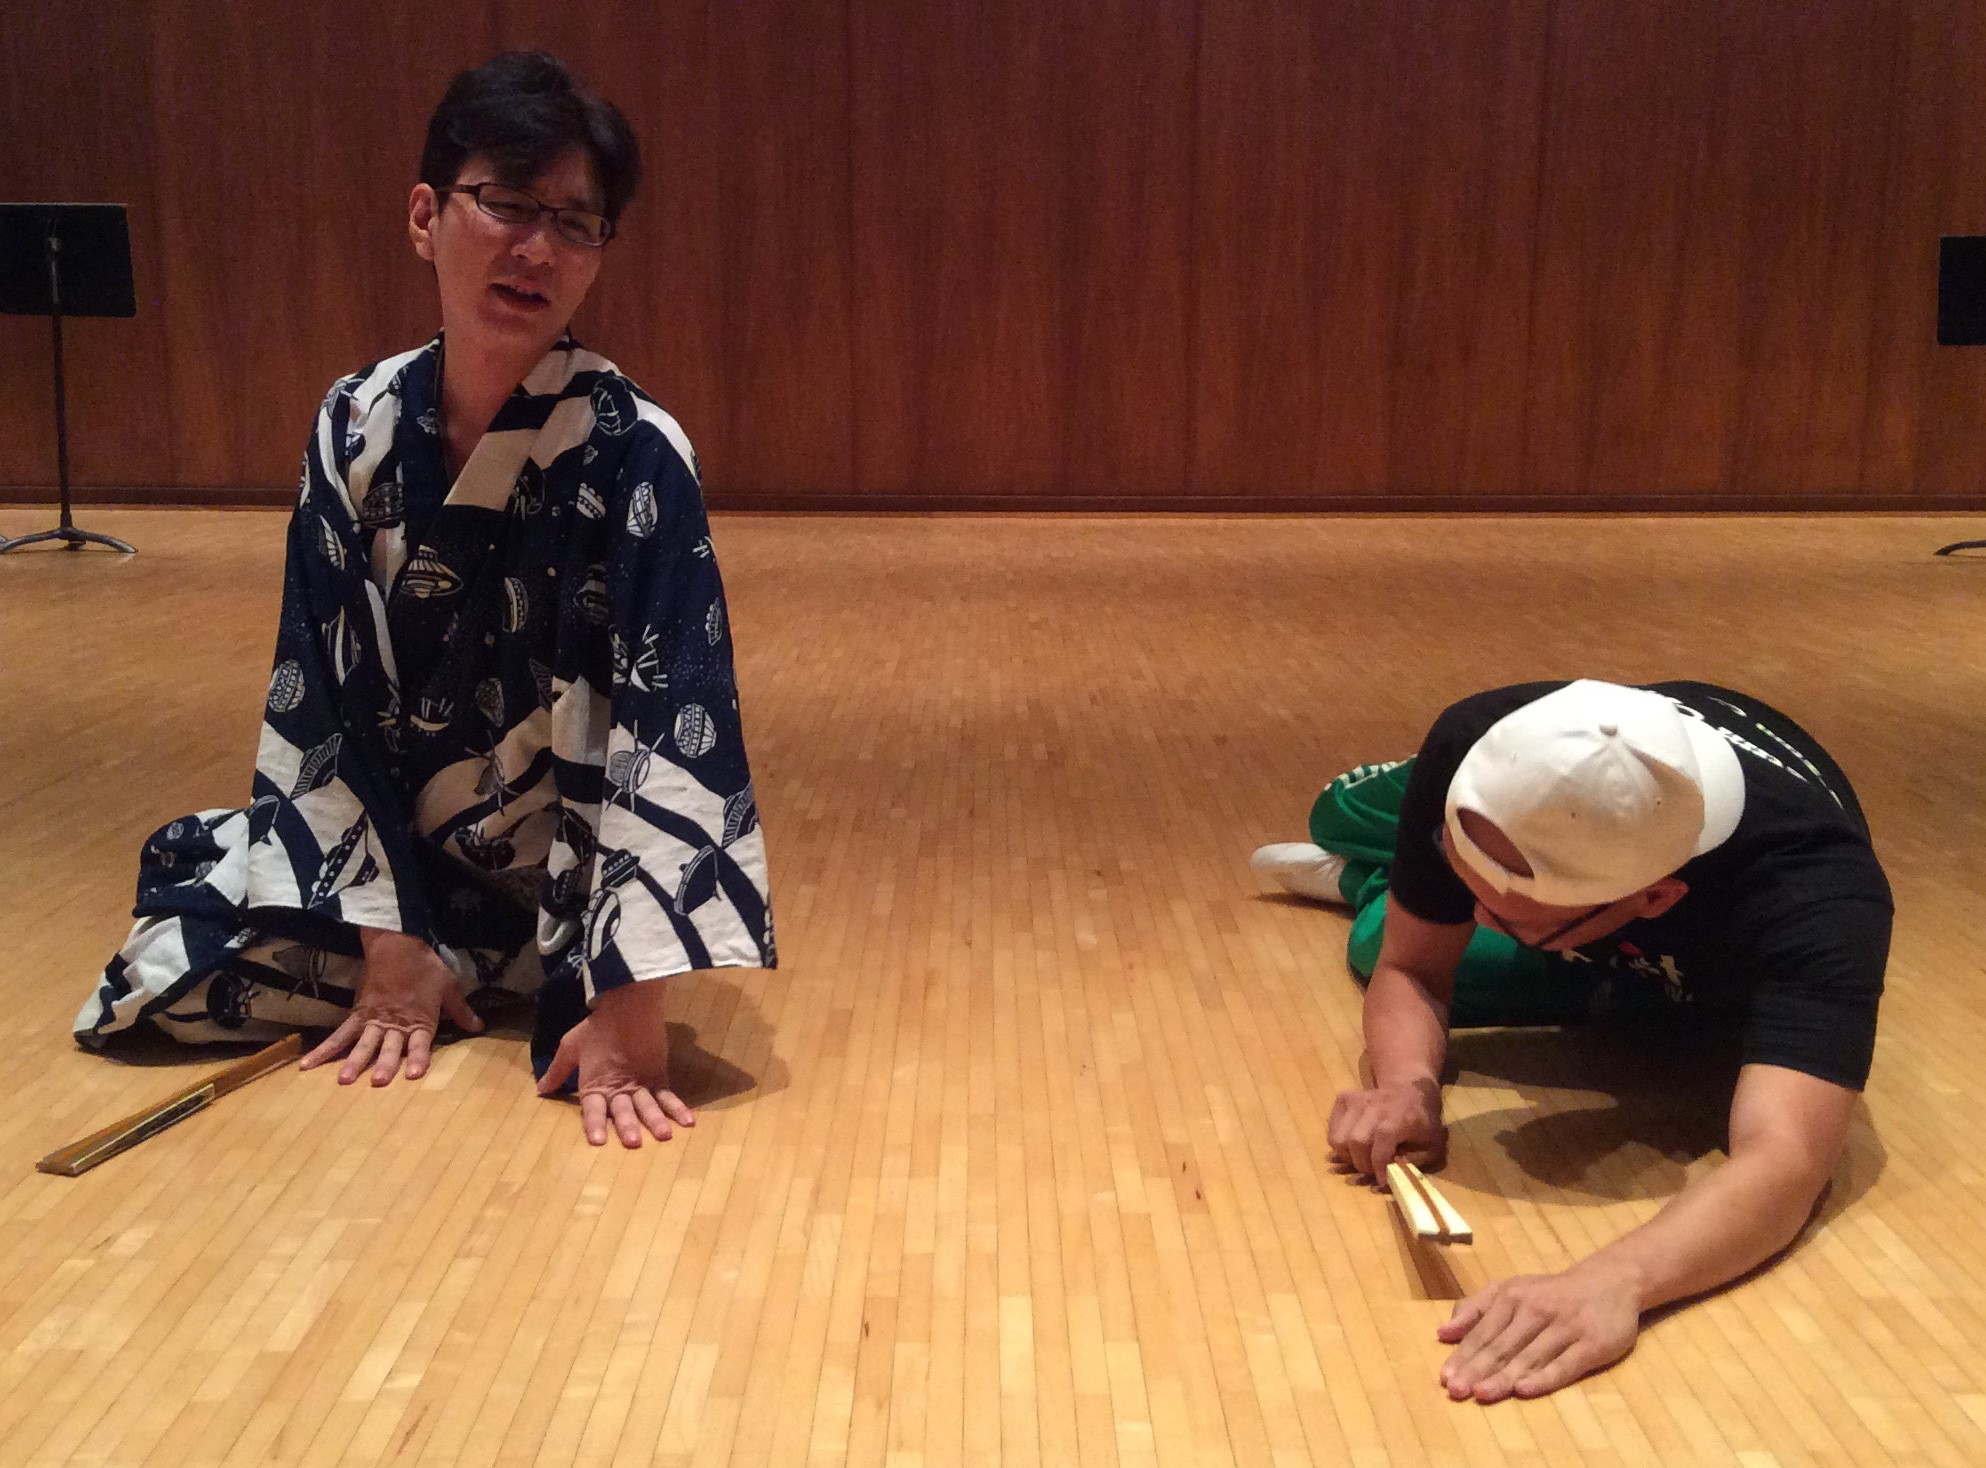 Shigeyama Sennojō III teaches a UHM student on the floor